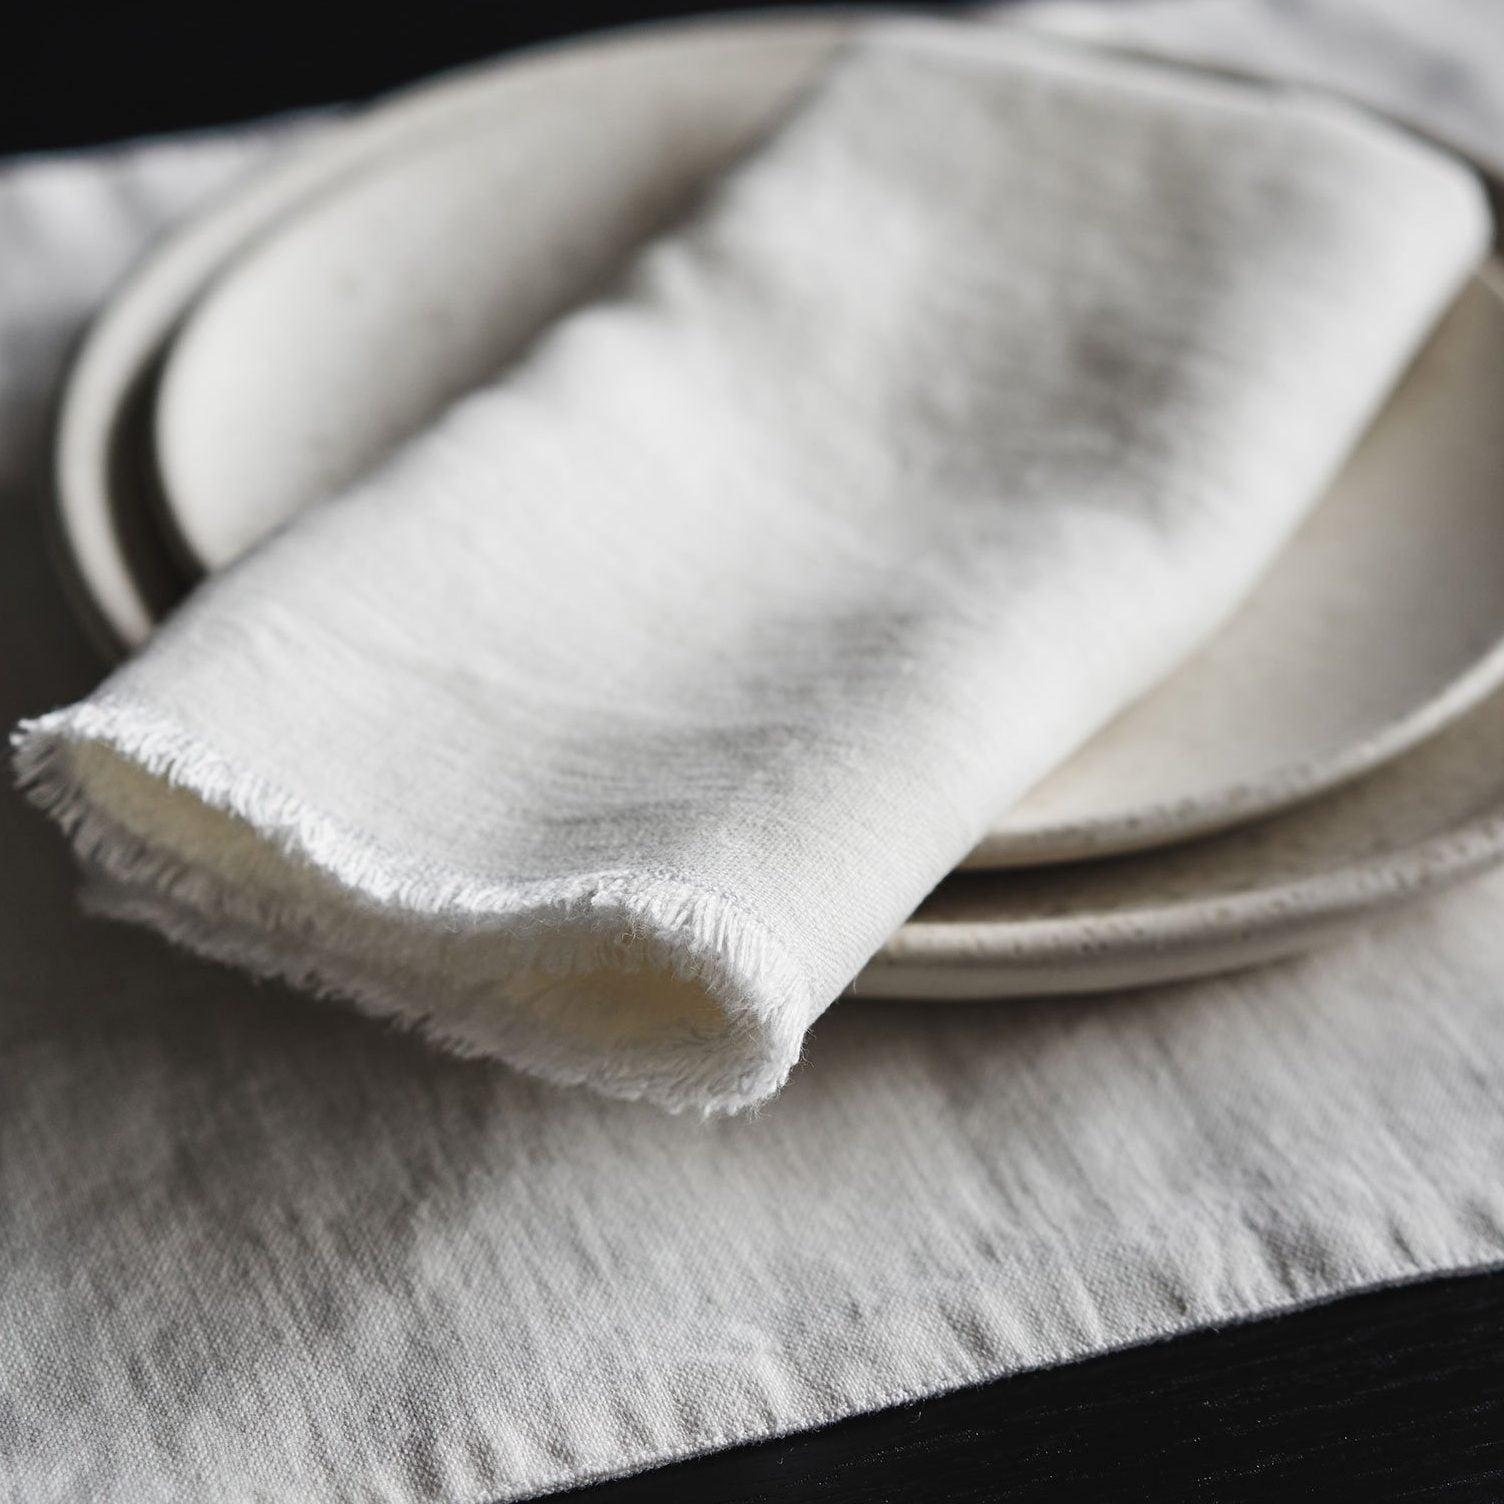 rw_guild_product_flax_linen_white_napkin_e2d0c0cd-07c7-4697-8511-6f38002f170d